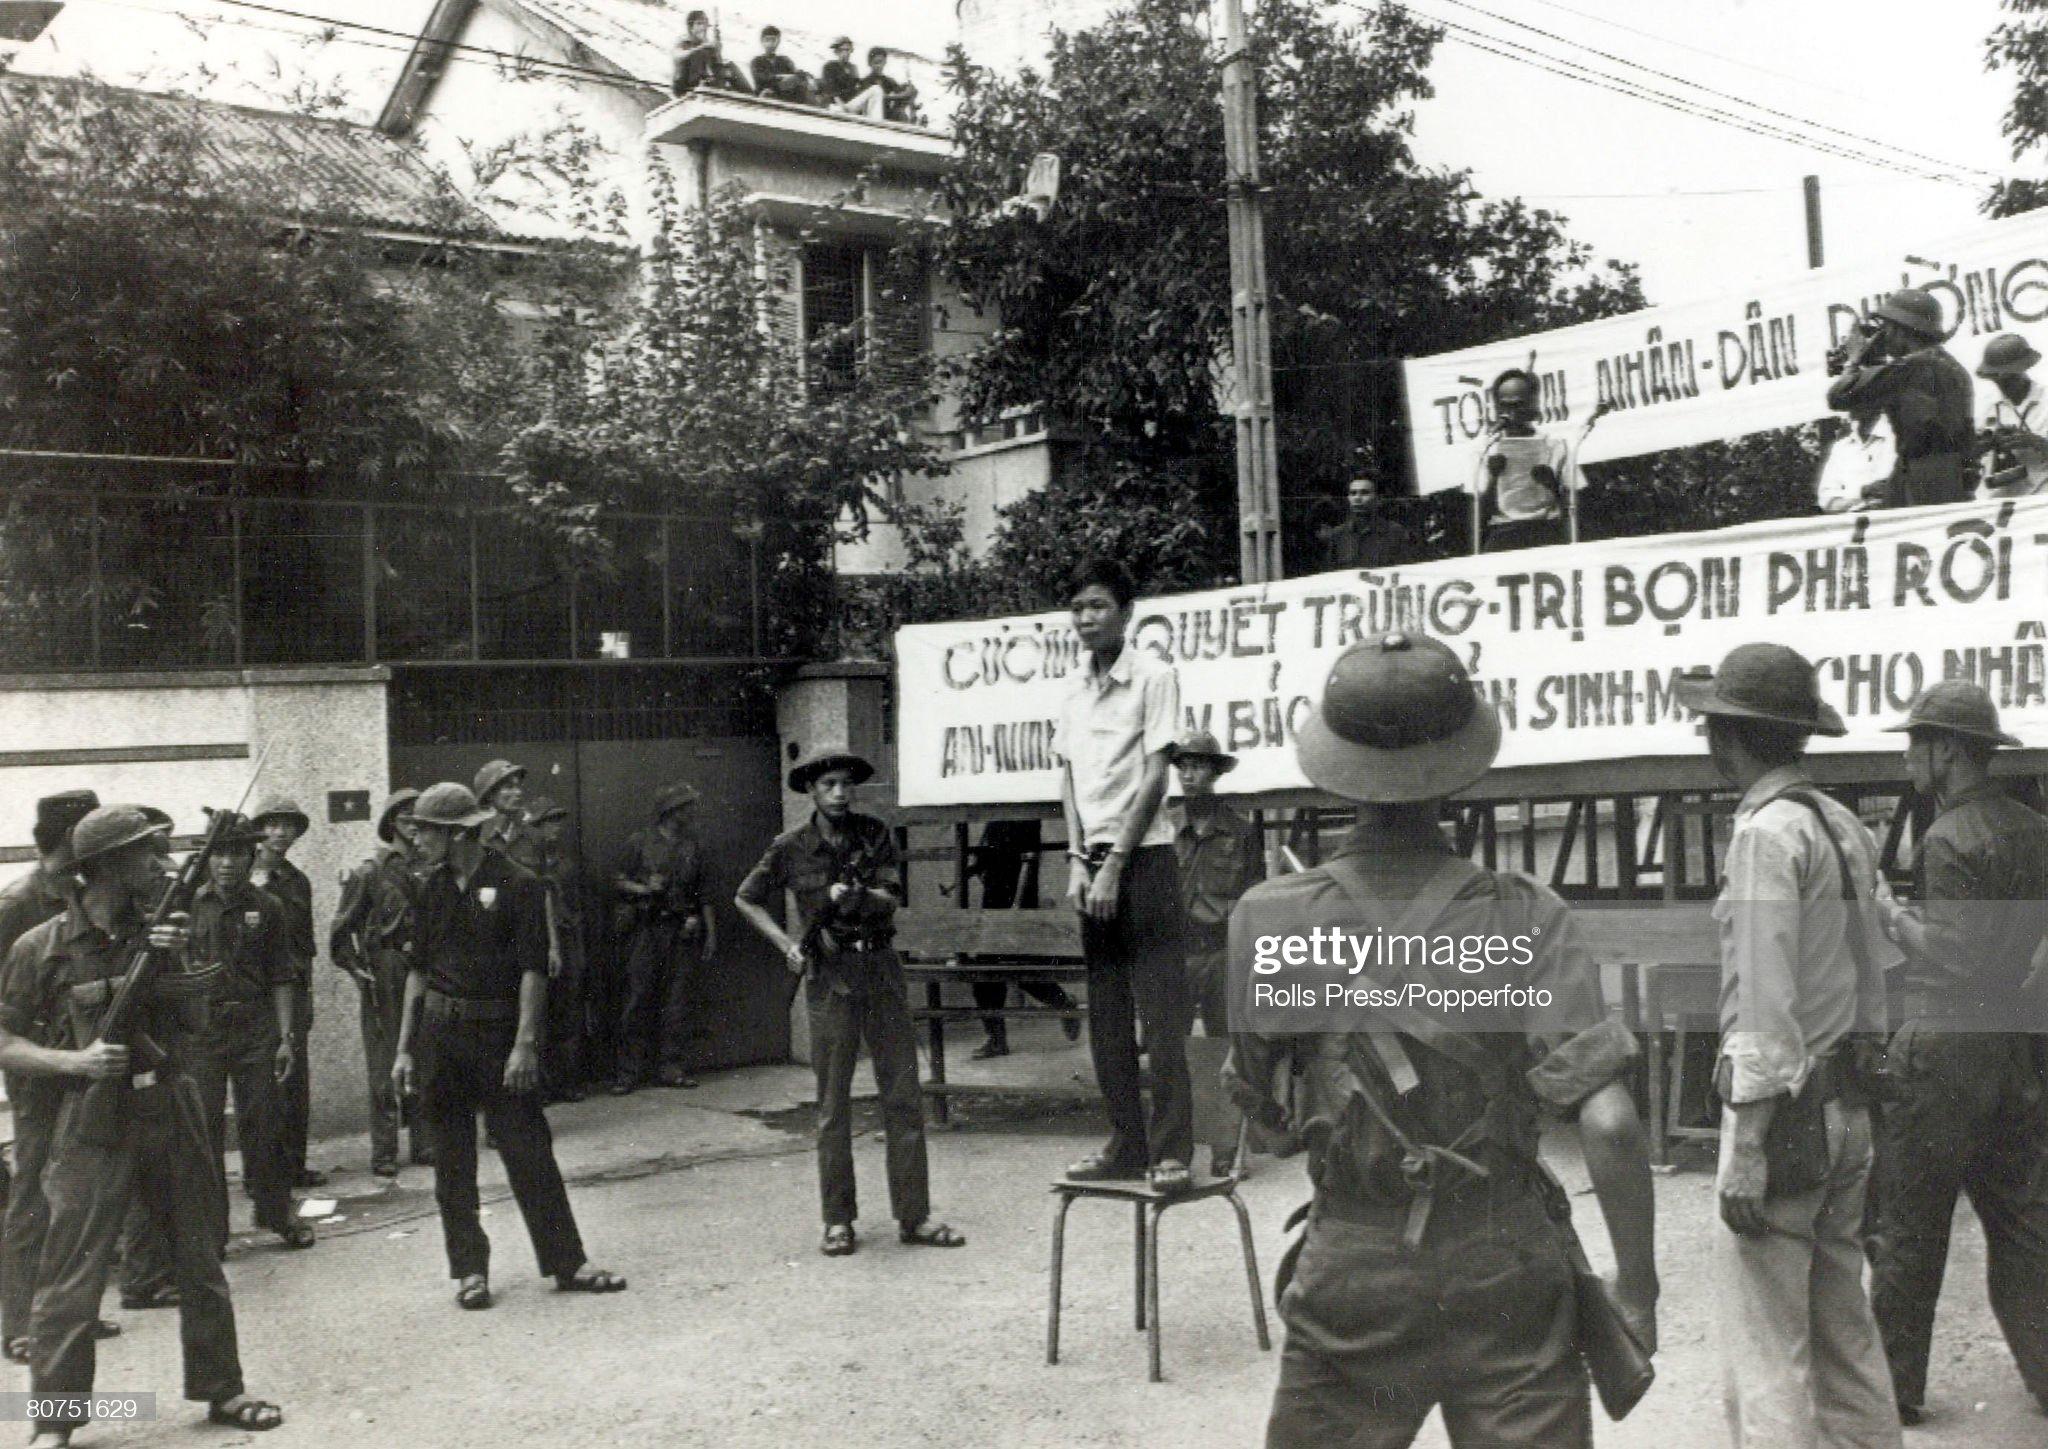 Coi chừng đừng bán phim lậu War-and-conflict-the-vietnam-war-pic-june-1975-nguyen-tu-sang-saigon-picture-id80751629?s=2048x2048